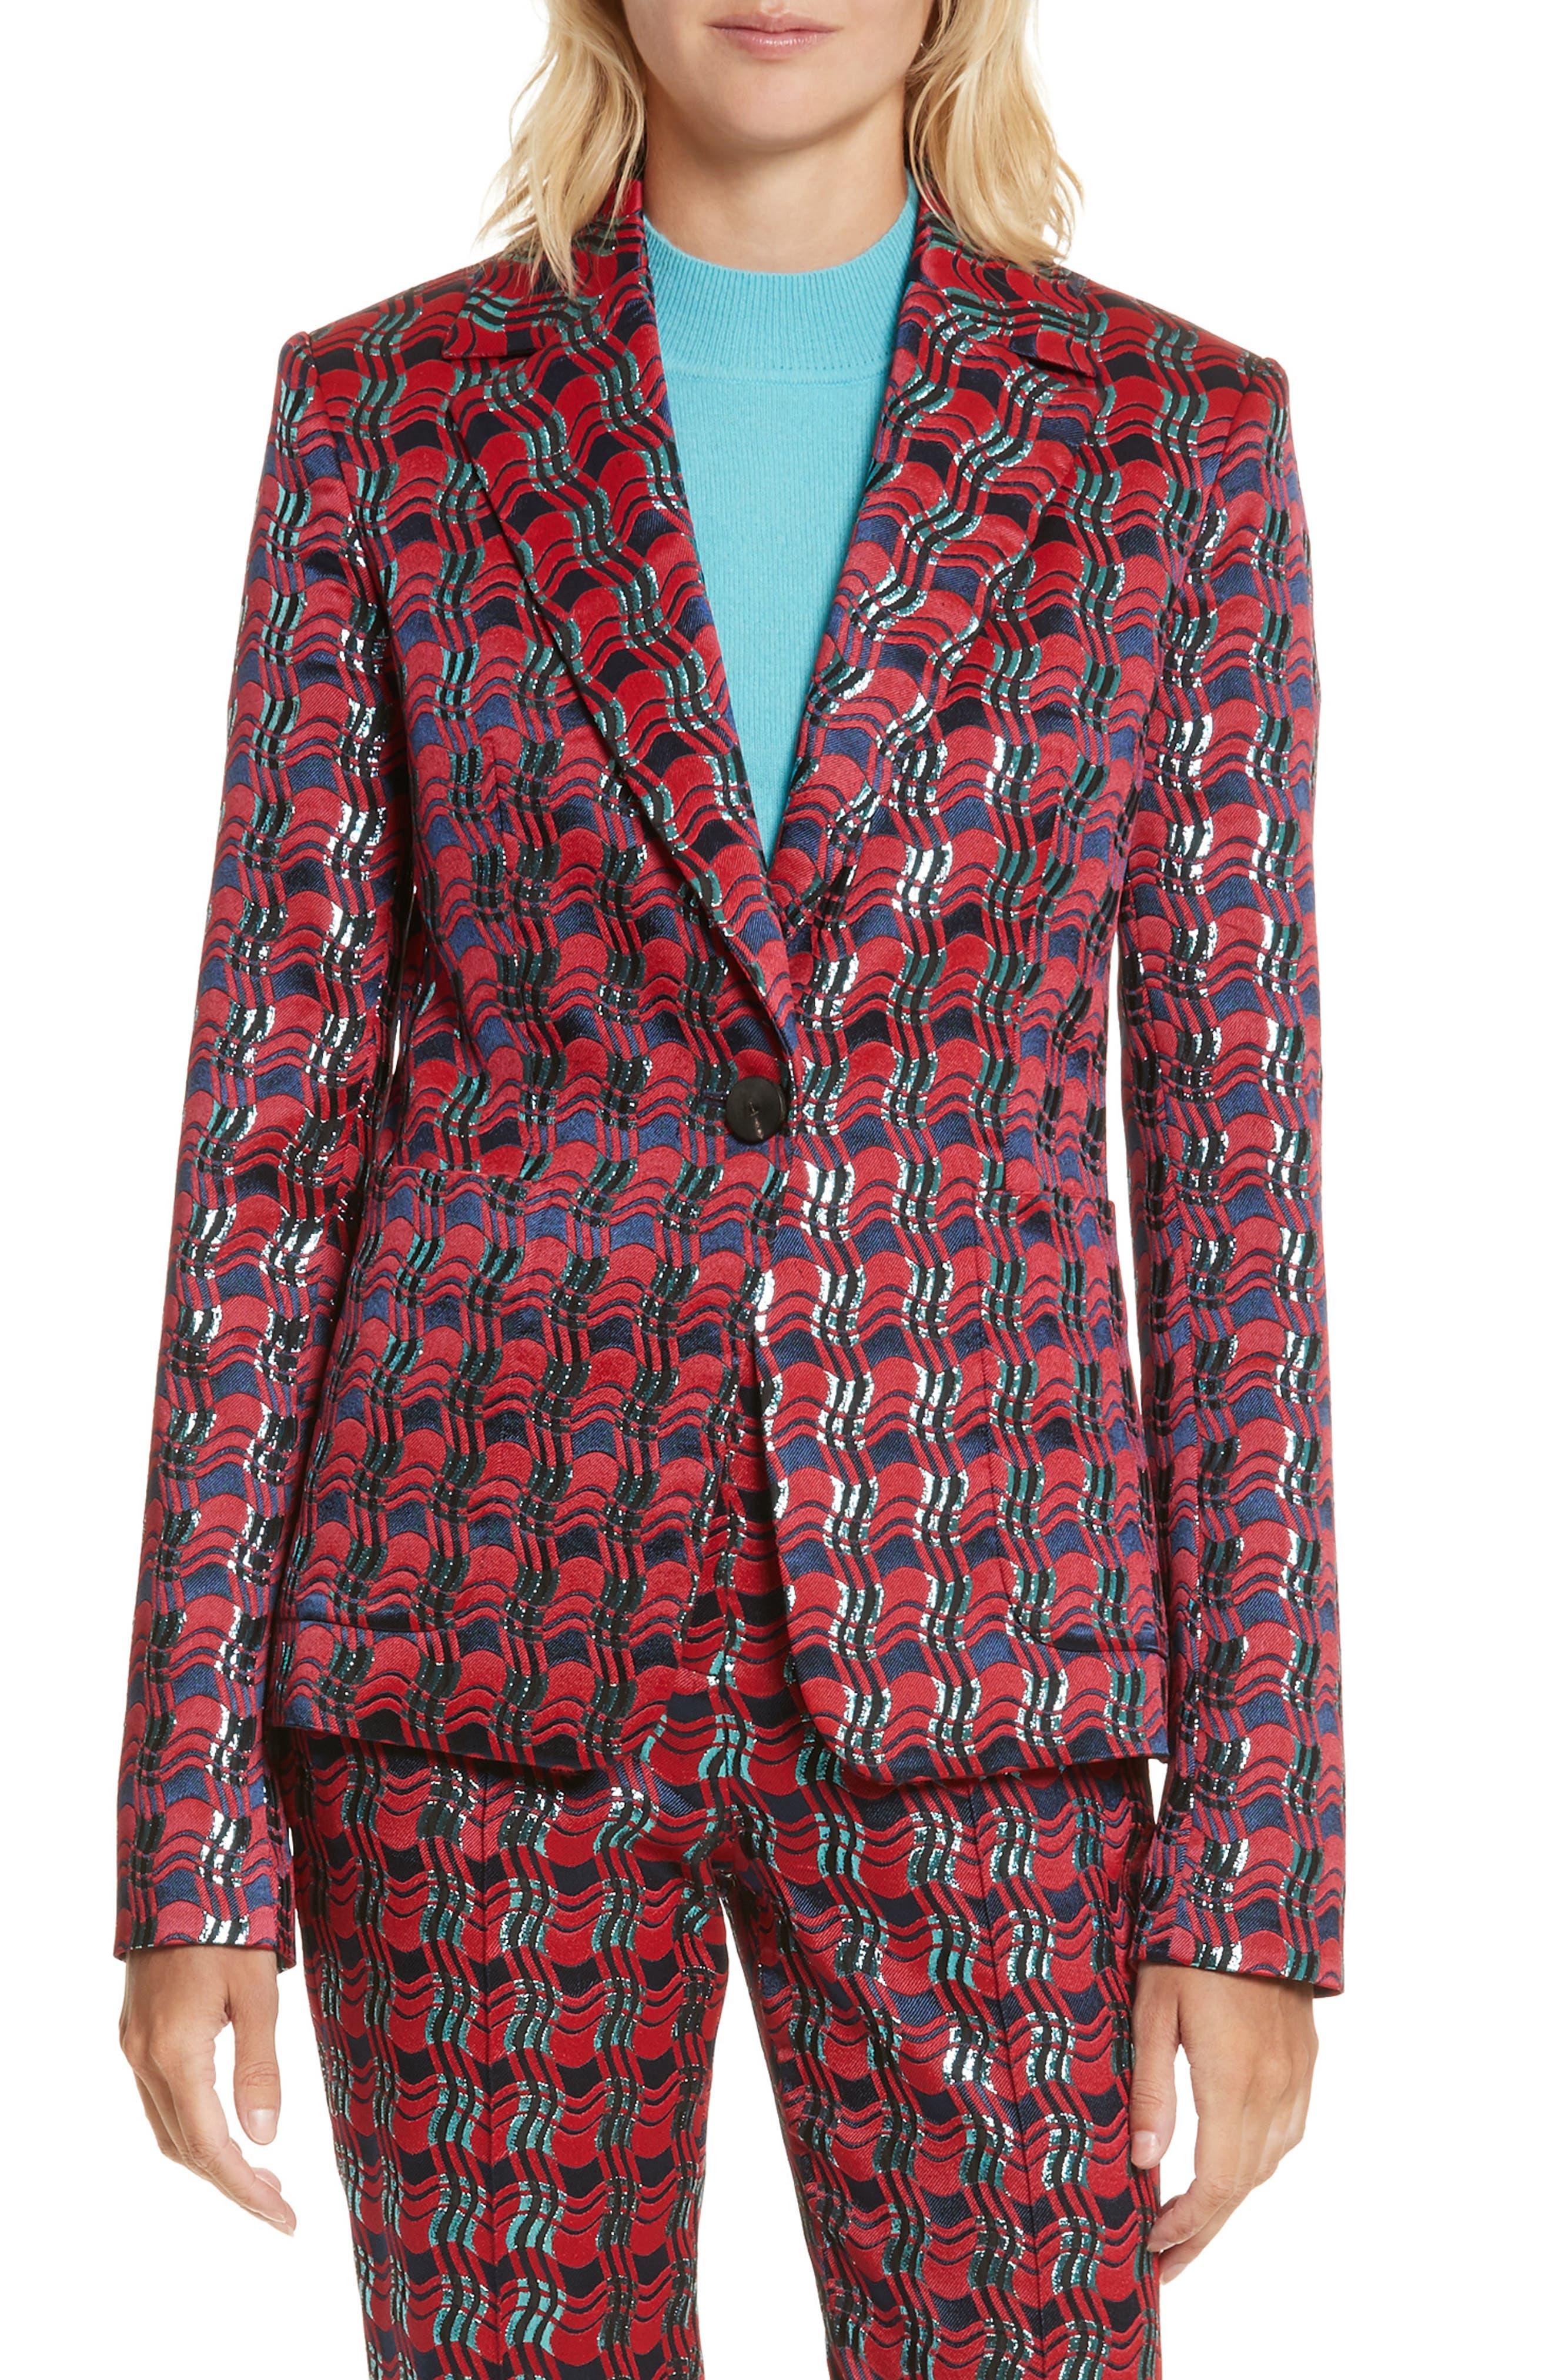 Alternate Image 1 Selected - Diane von Furstenberg Tailored Jacquard Jacket